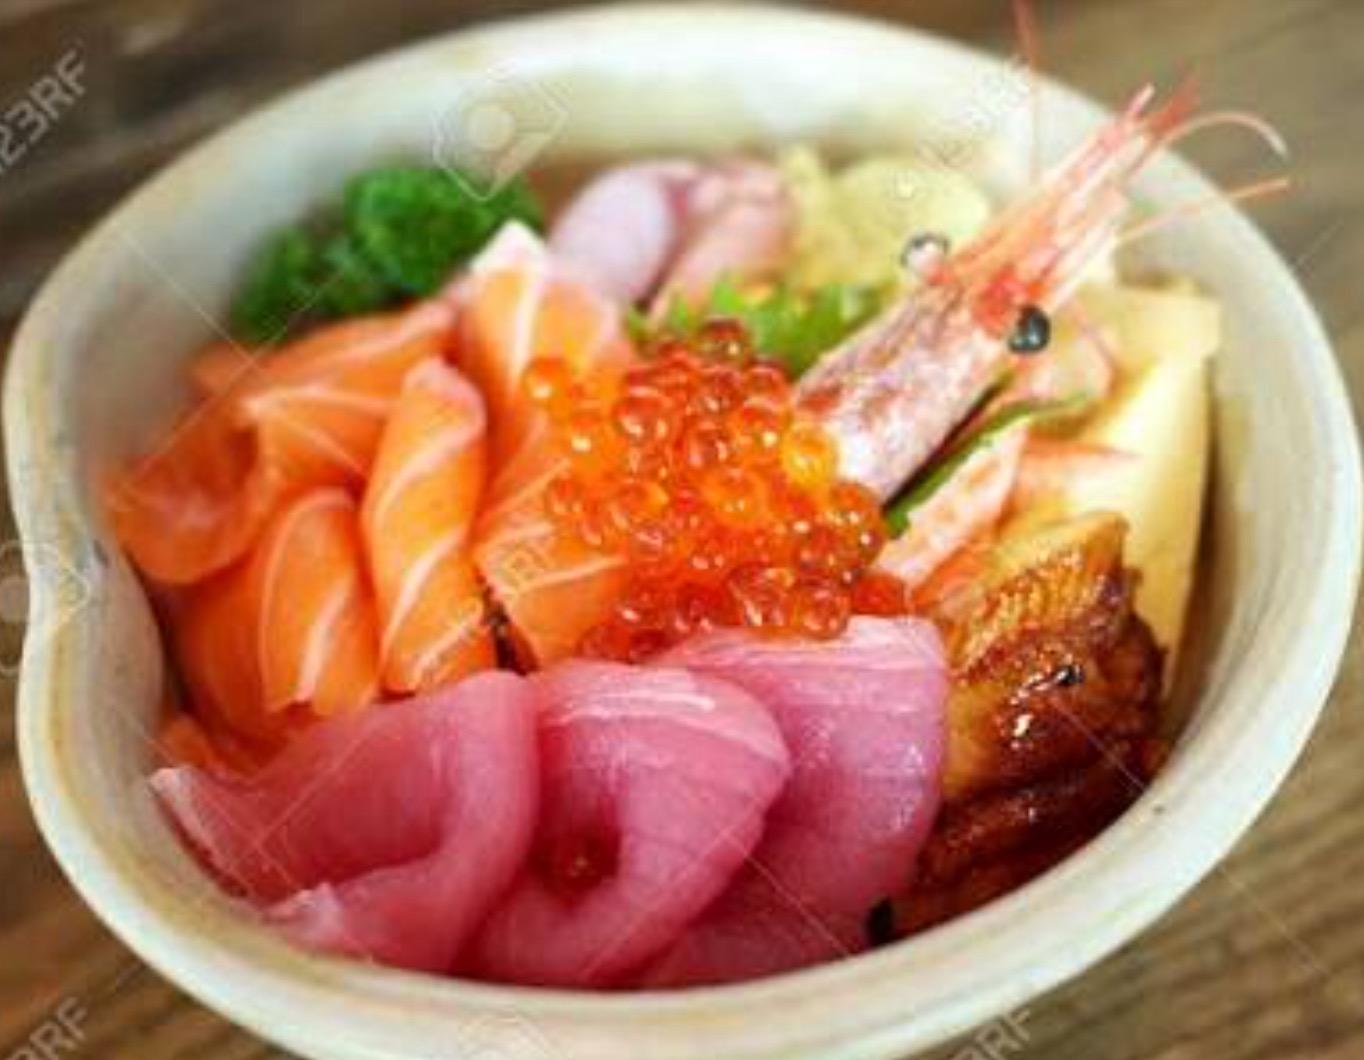 Sashimi salmon / tuna / shrimp